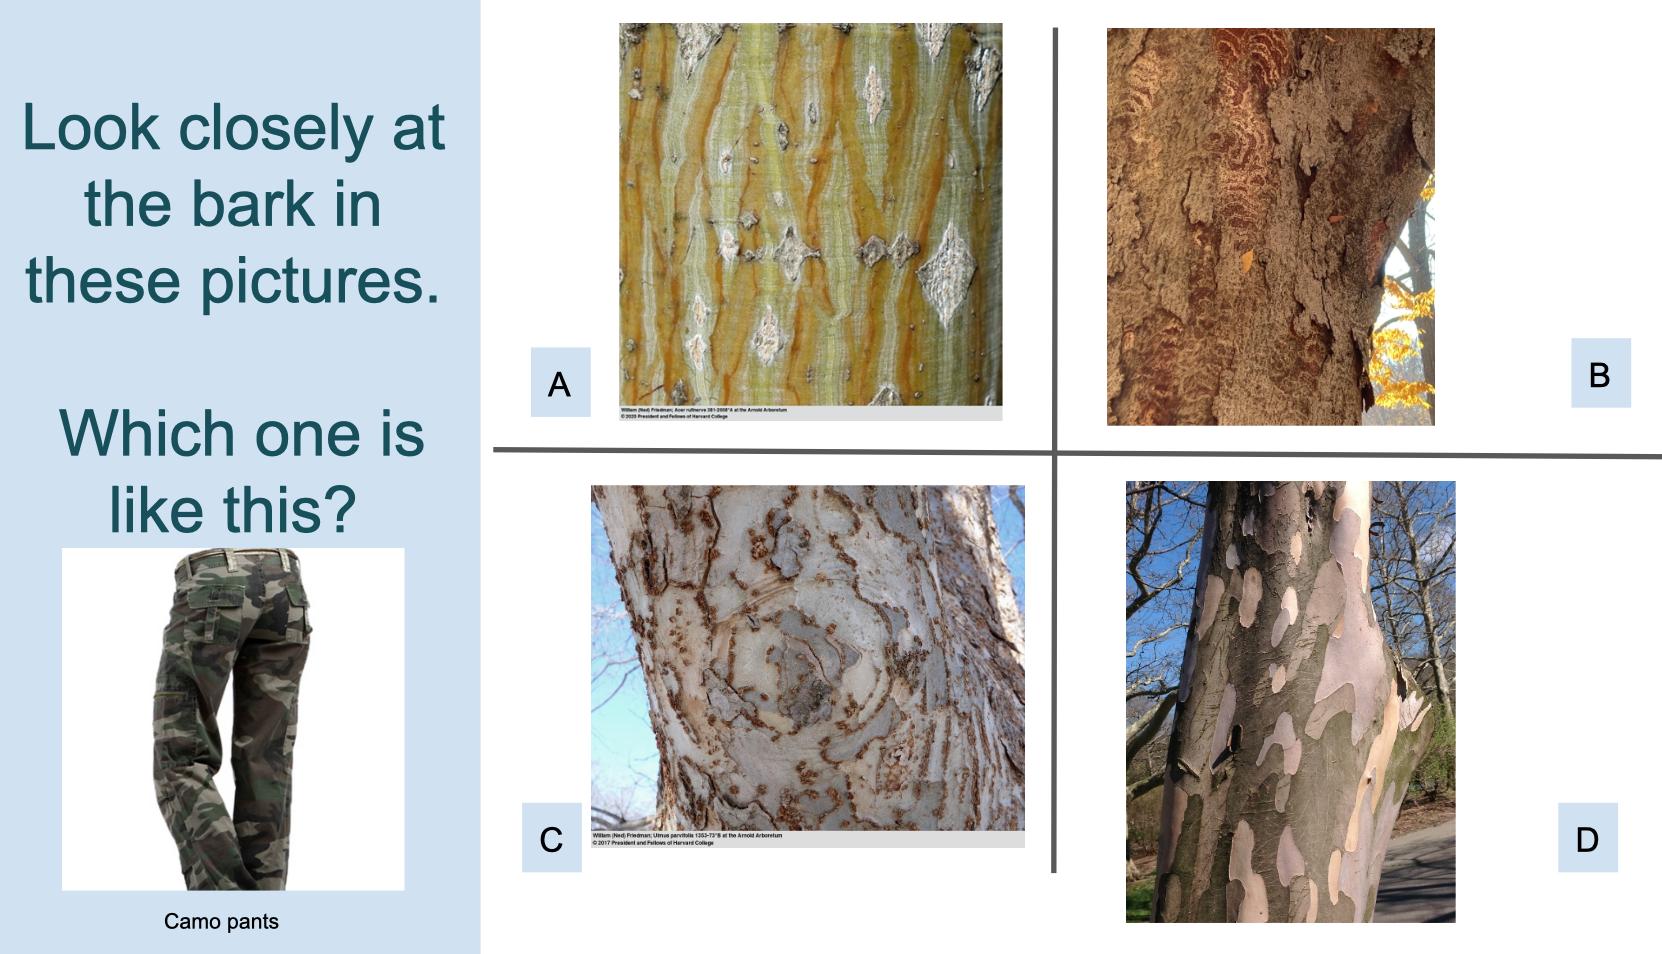 Sample Google Slide for Tree Bark deck showing four different bark and camouflage pants image.